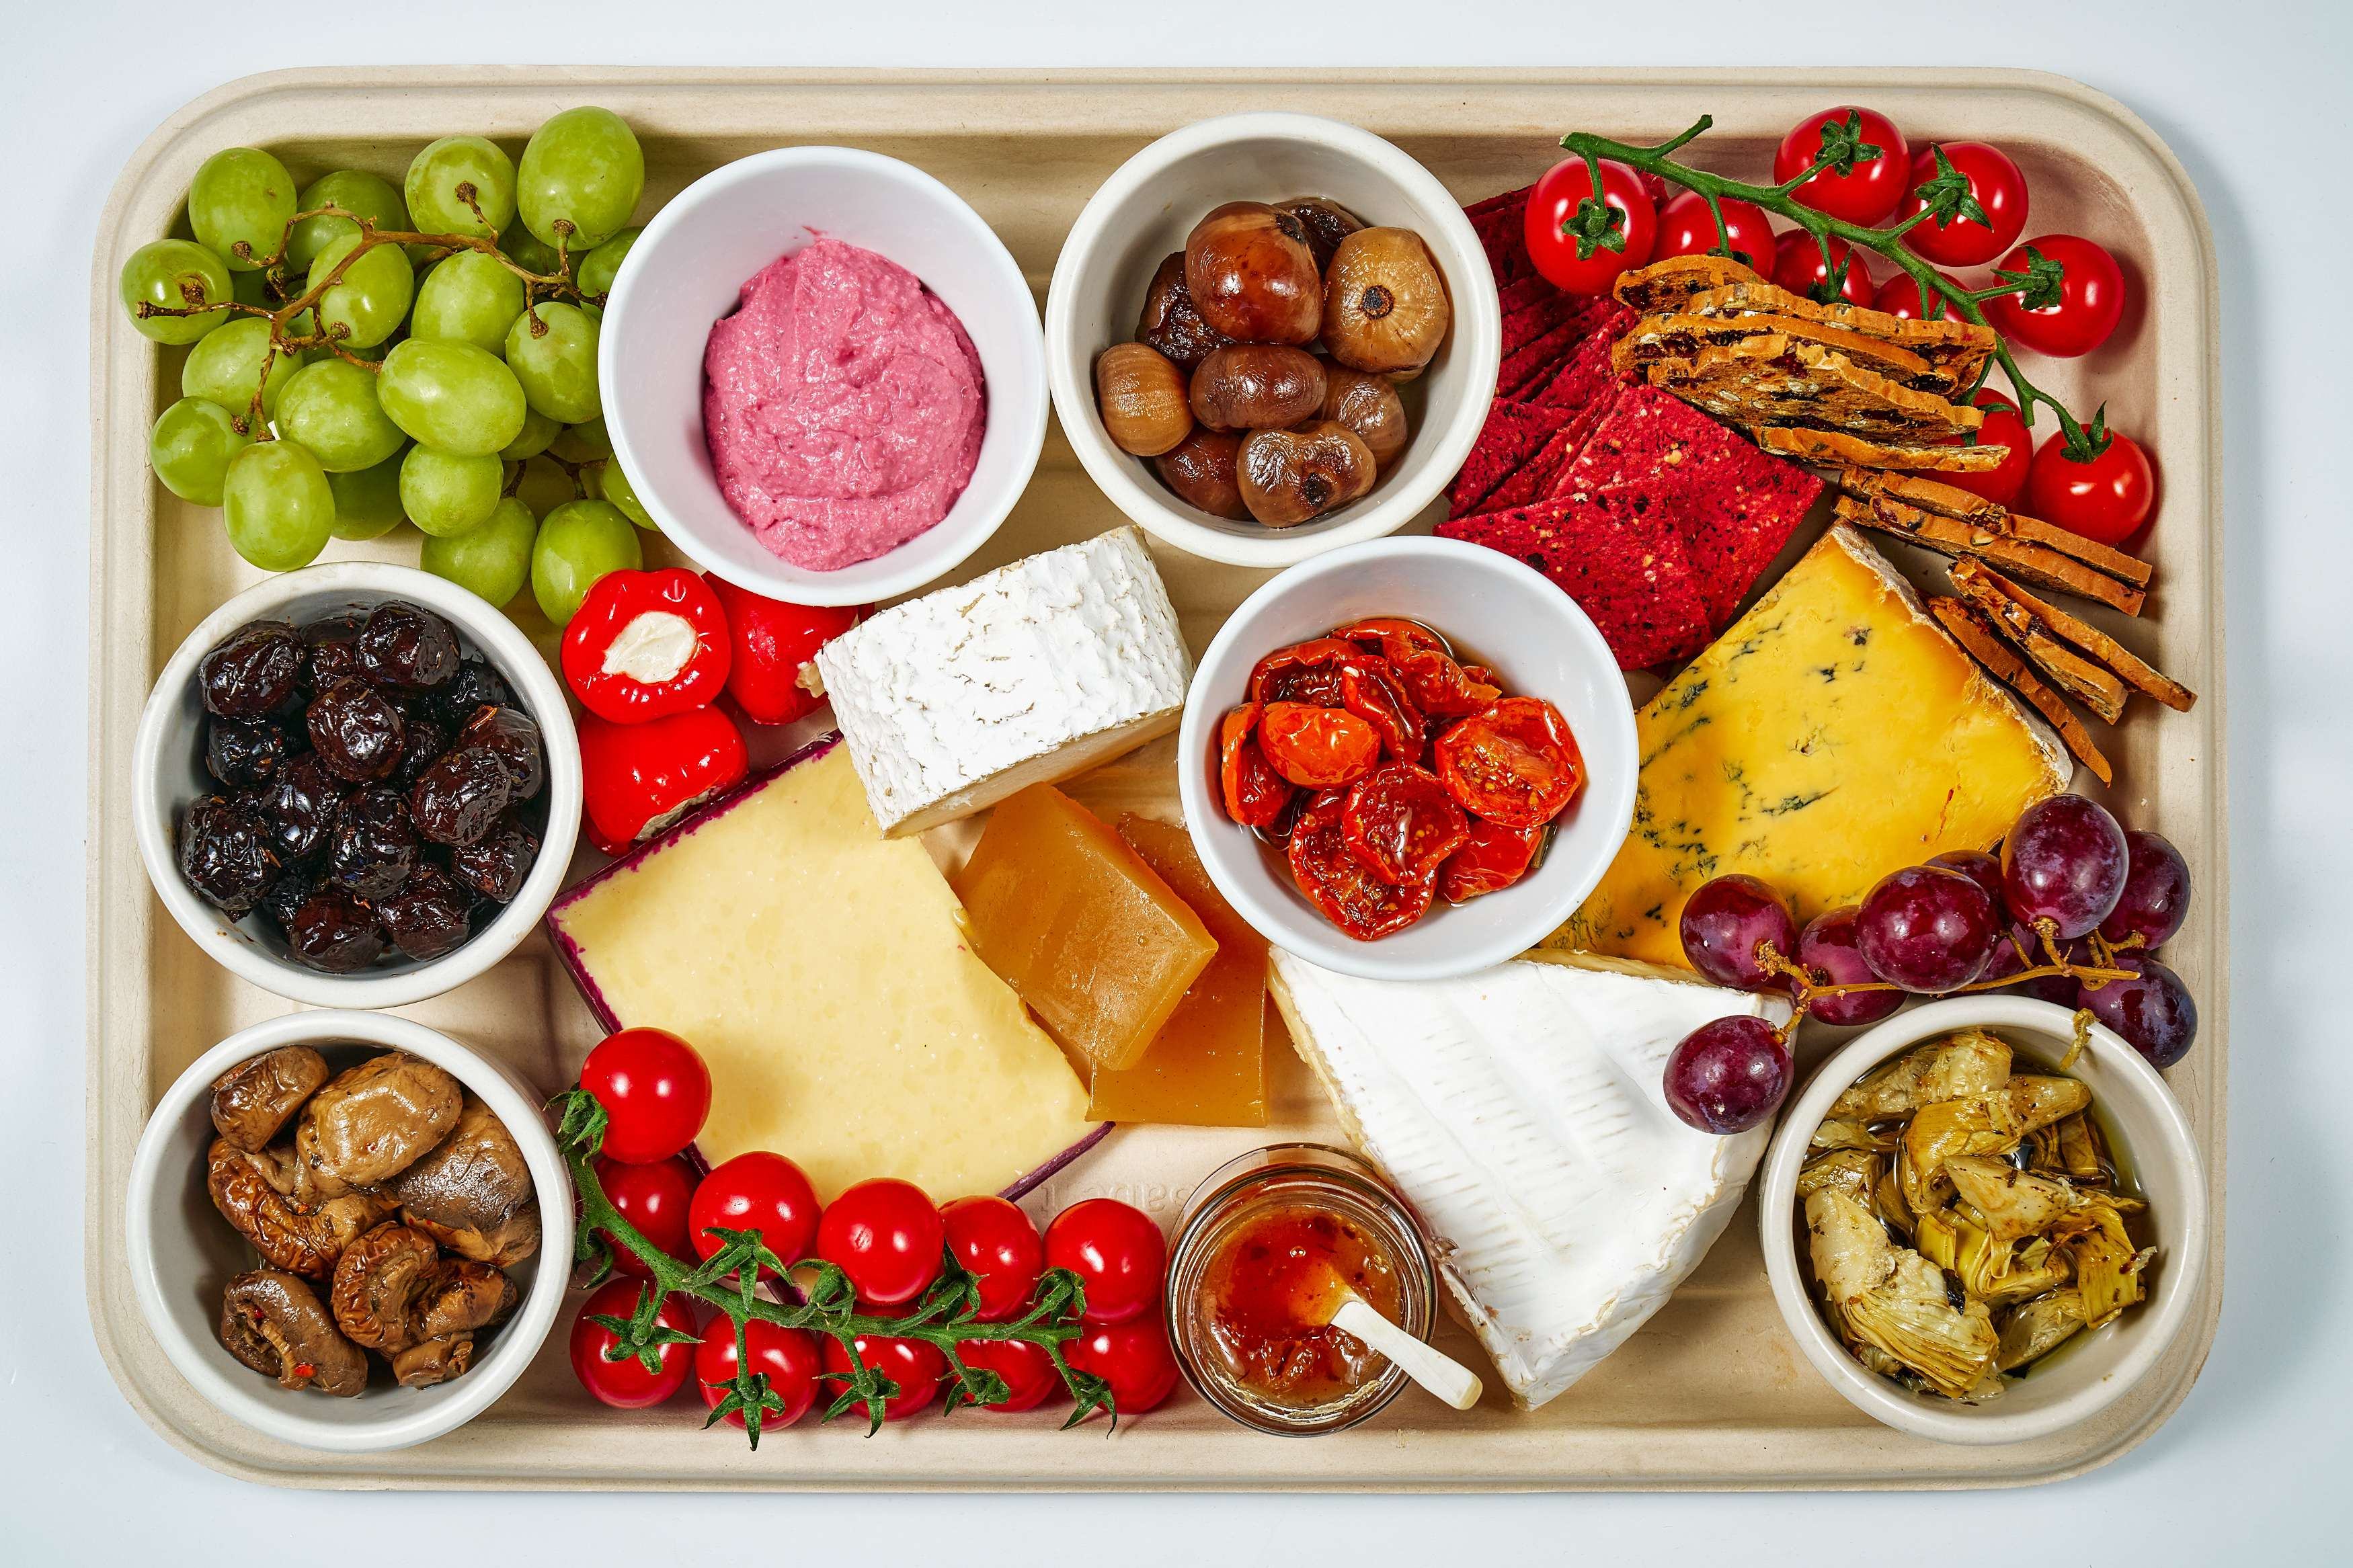 Vegetarian Cheese & Antipasti Platter (Large)